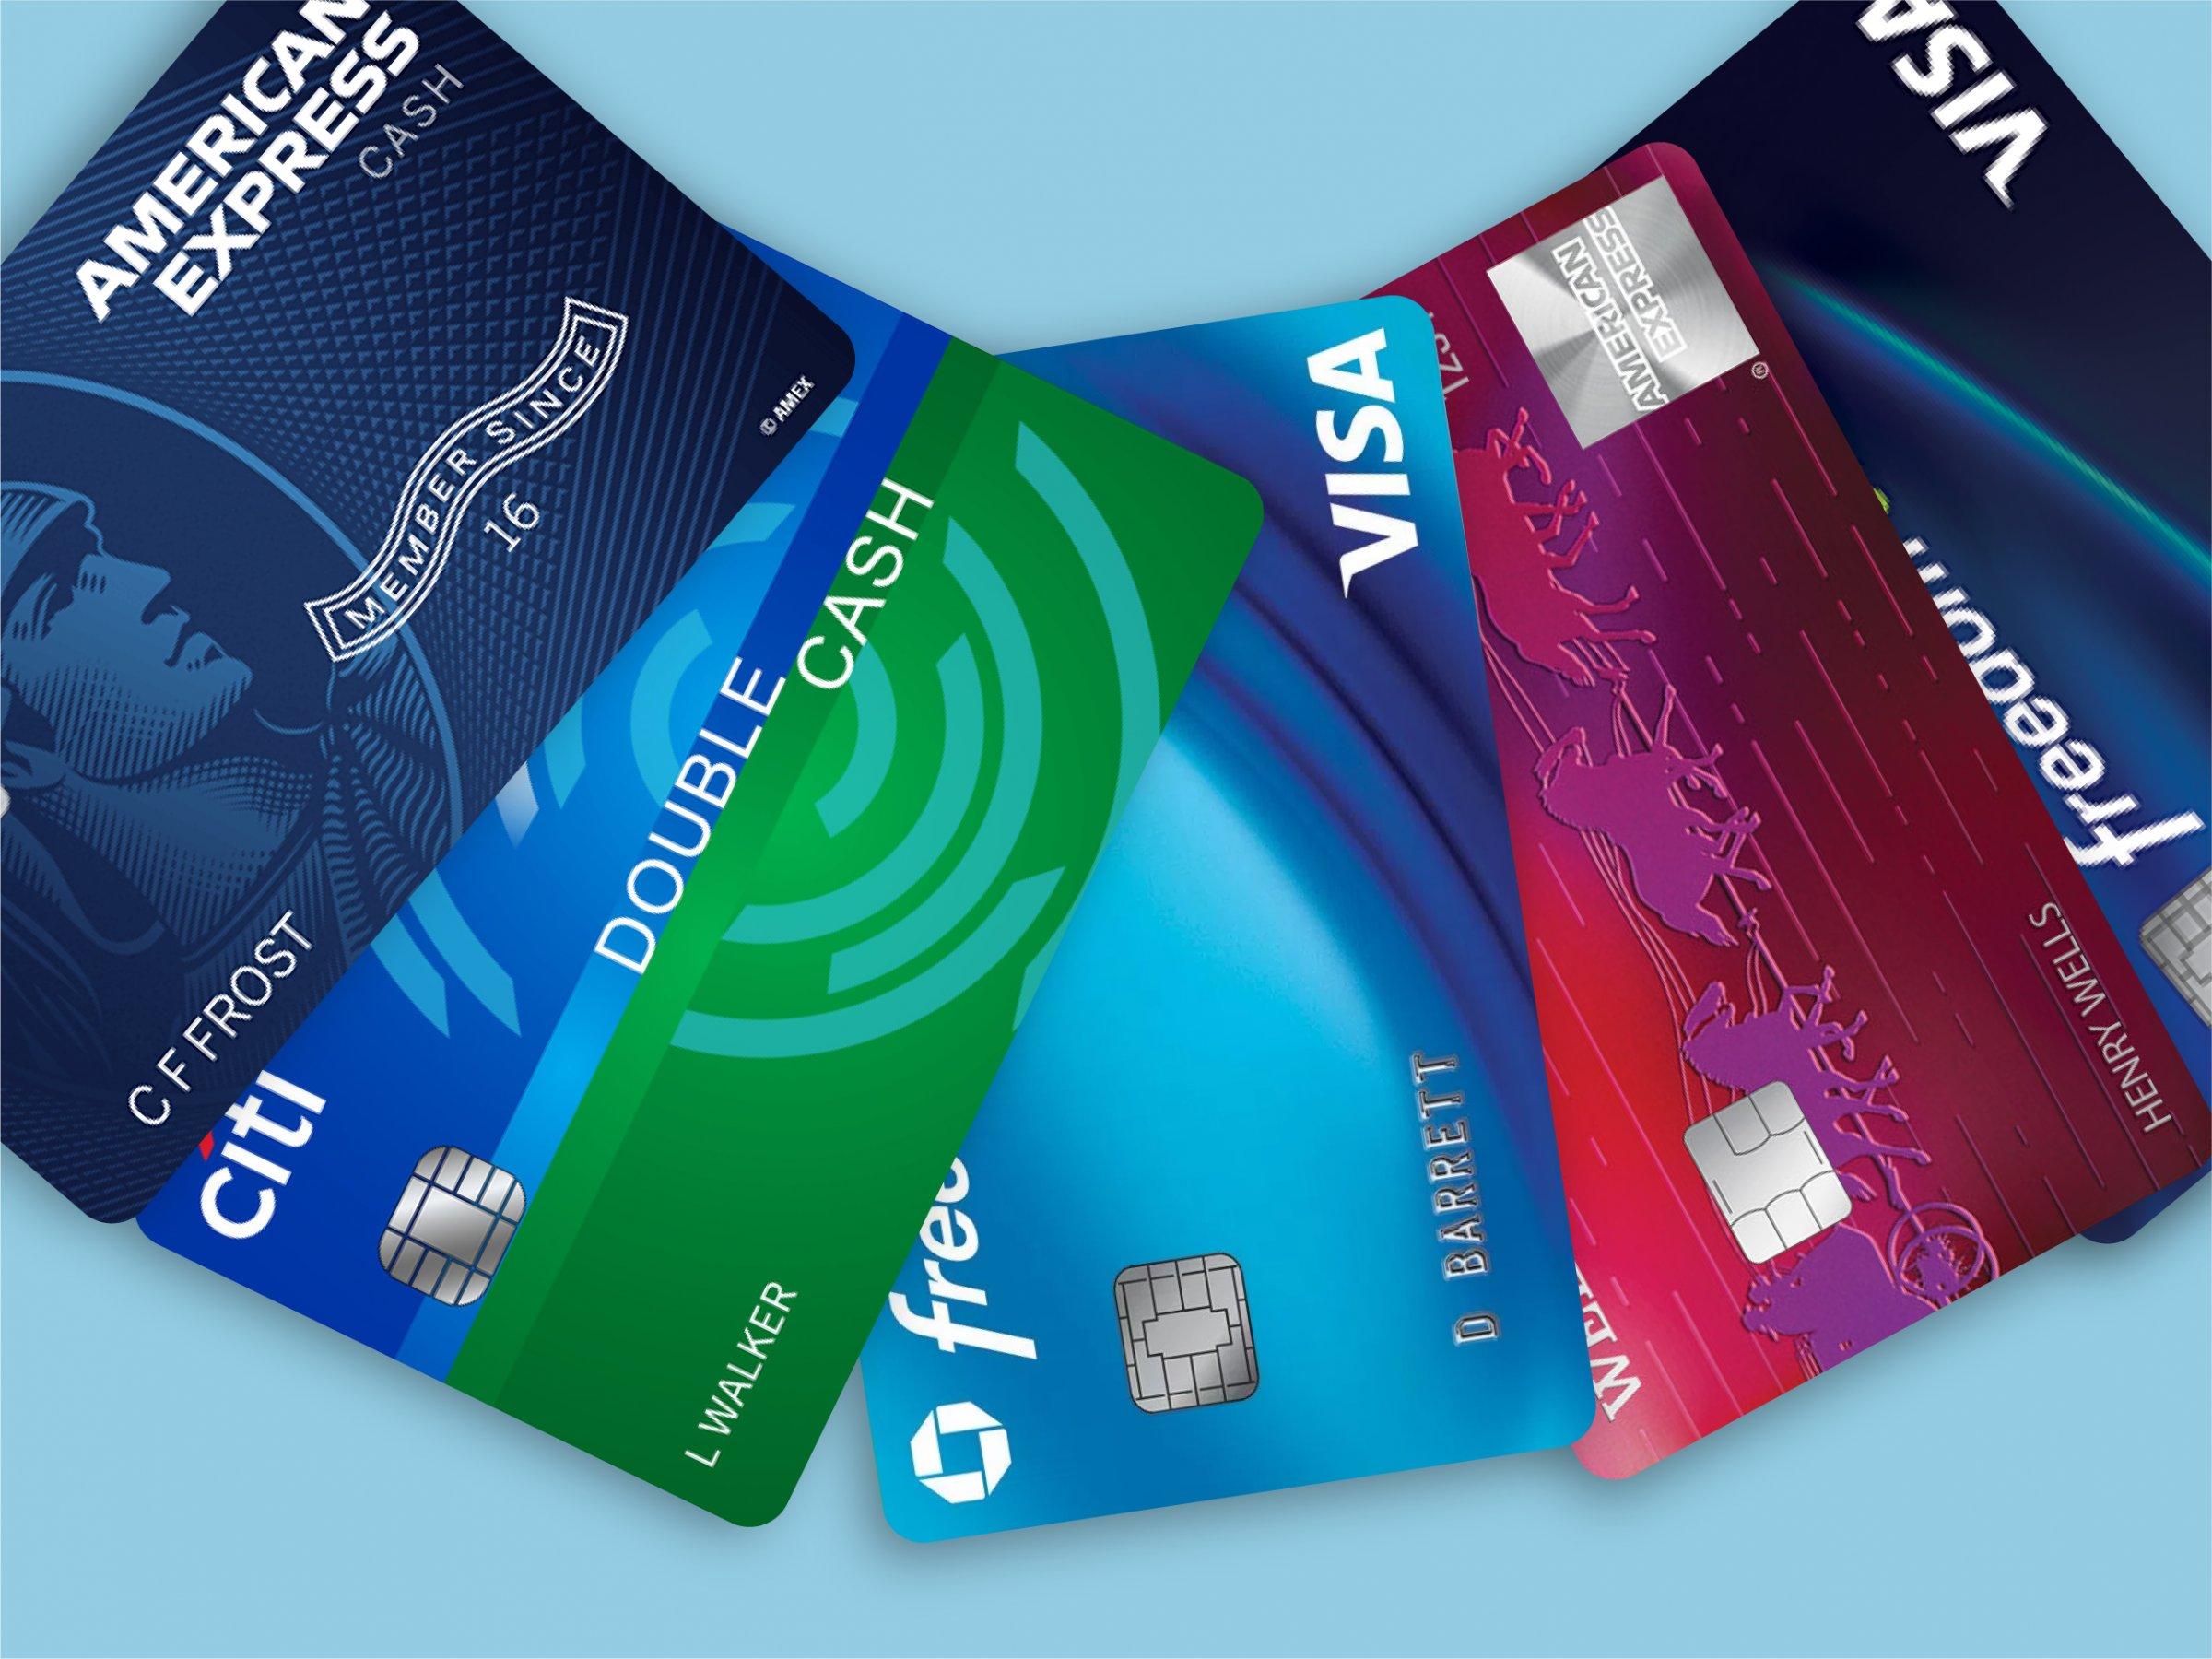 The best cash-back credit cards of 2020 - Pulse Nigeria